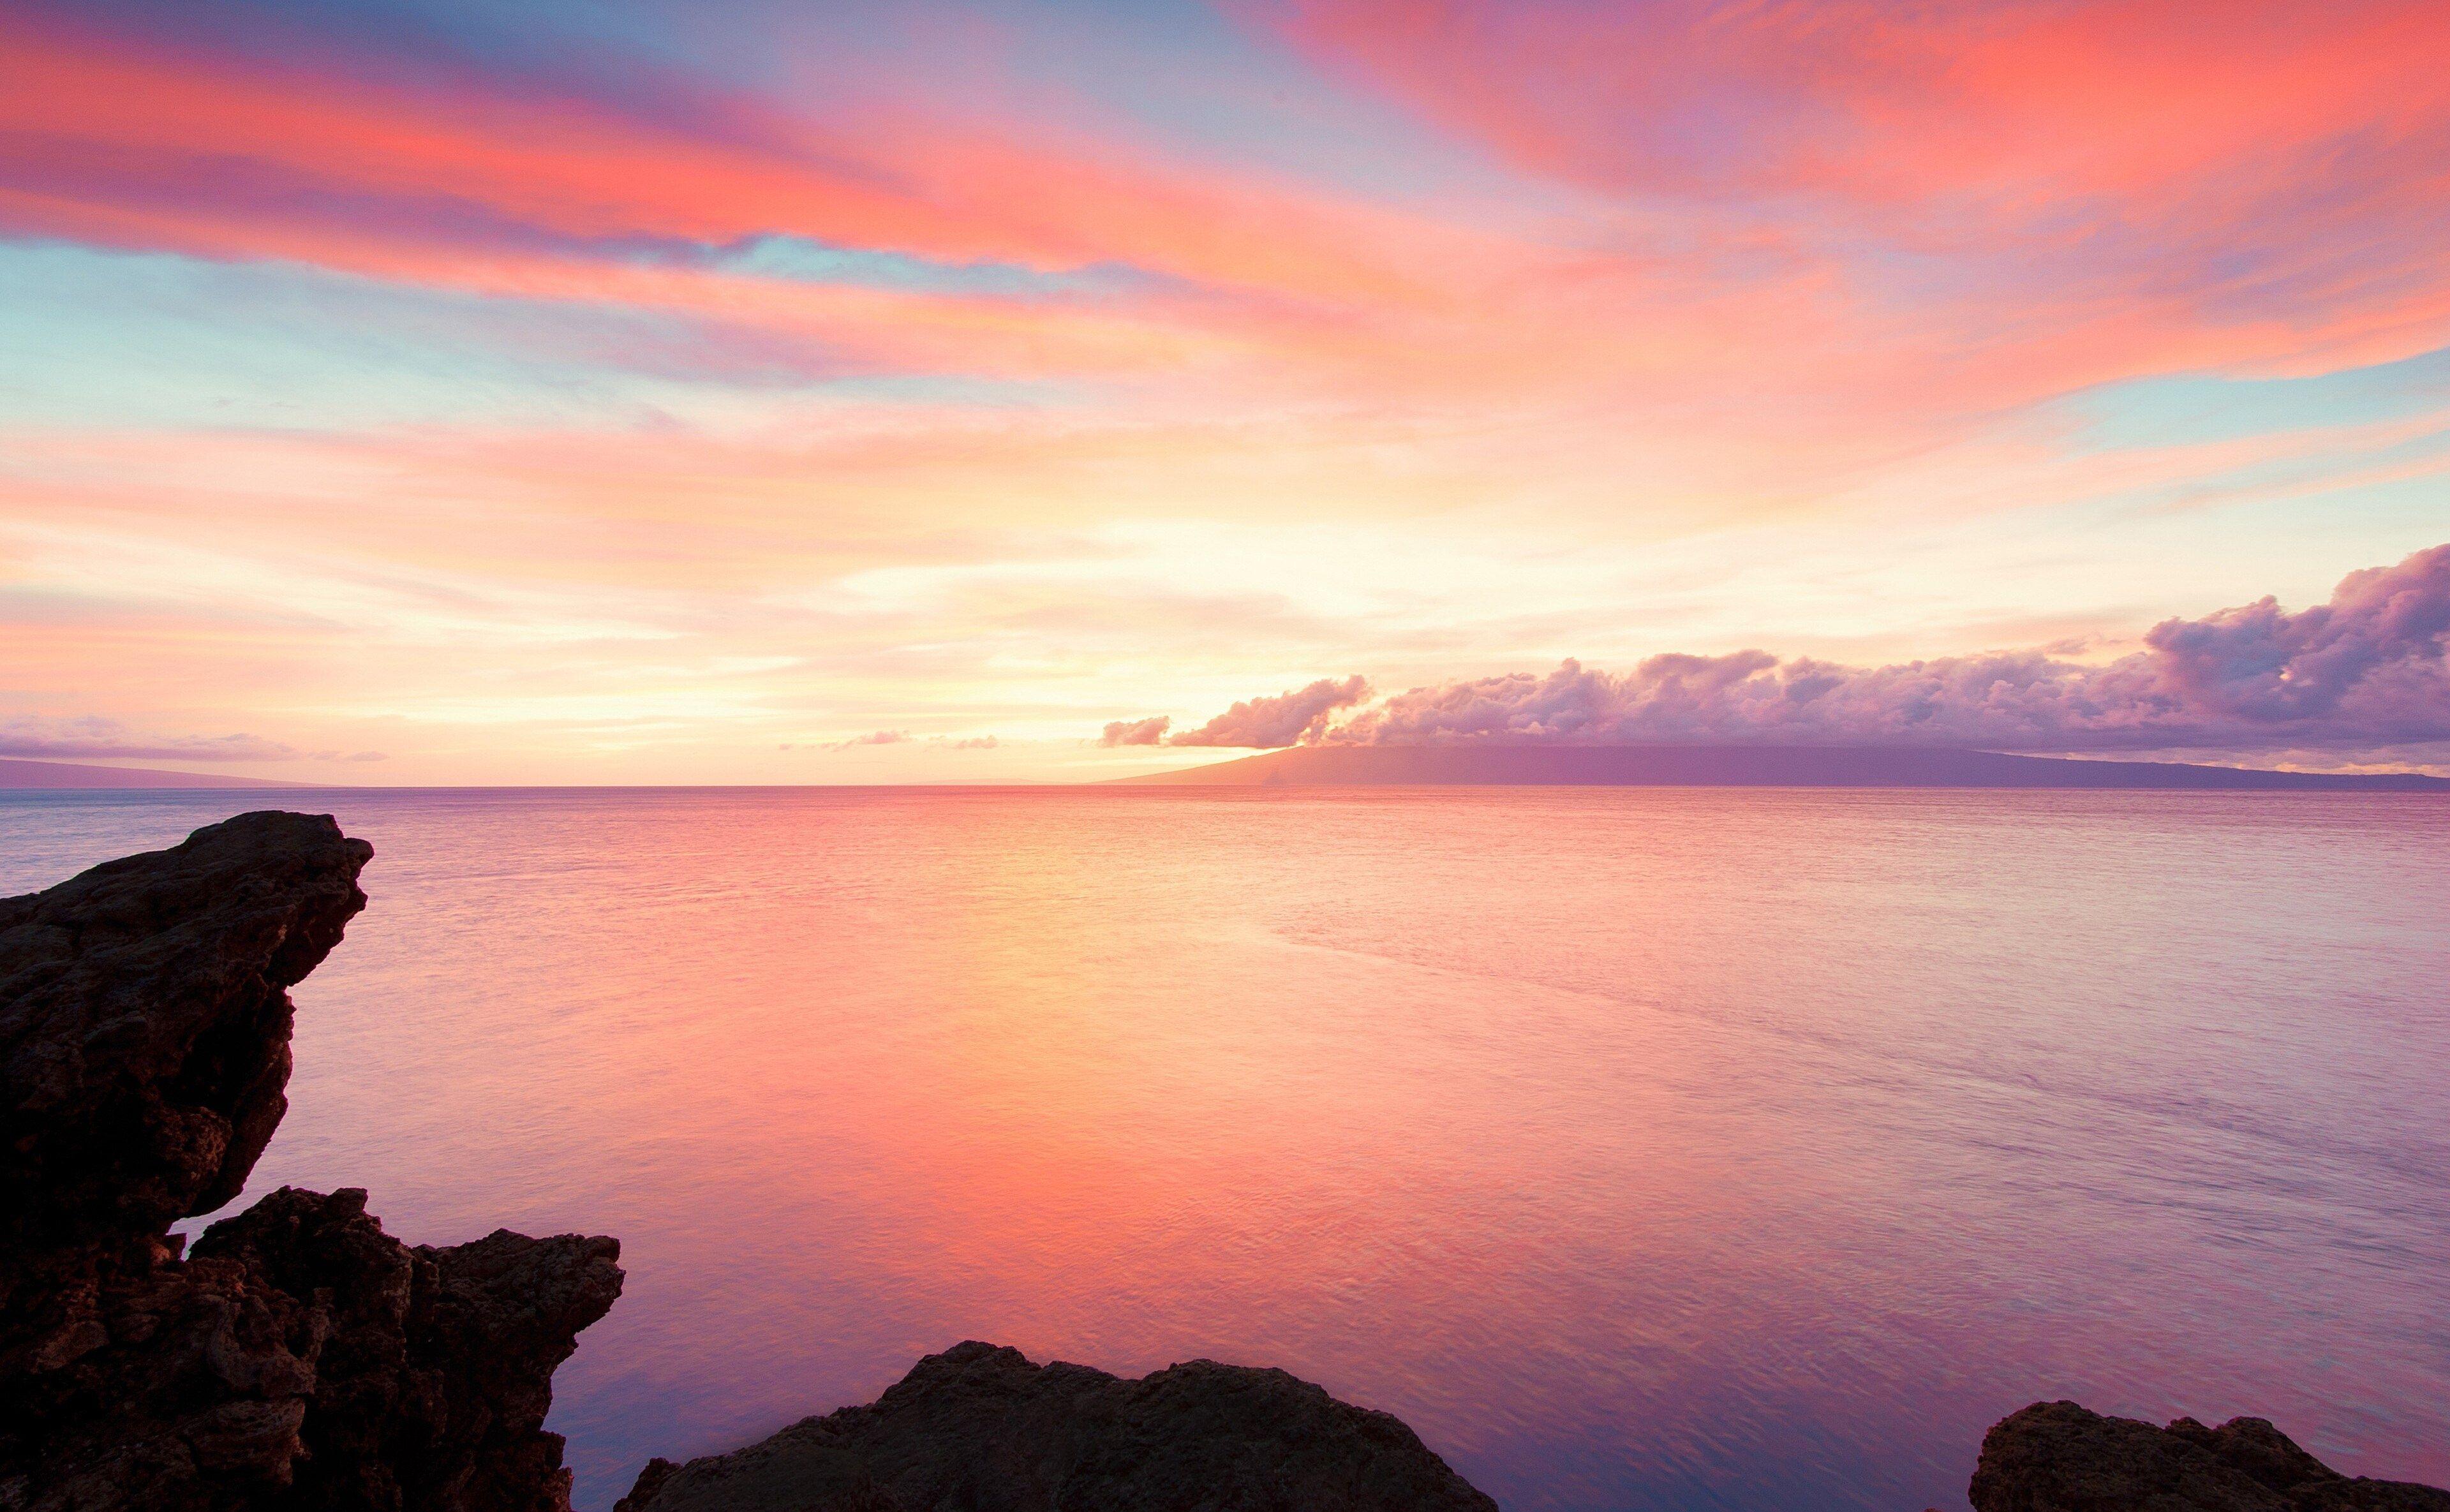 3840x2370 Sea 4k Free Full Hd Wallpaper Sunset Wallpaper